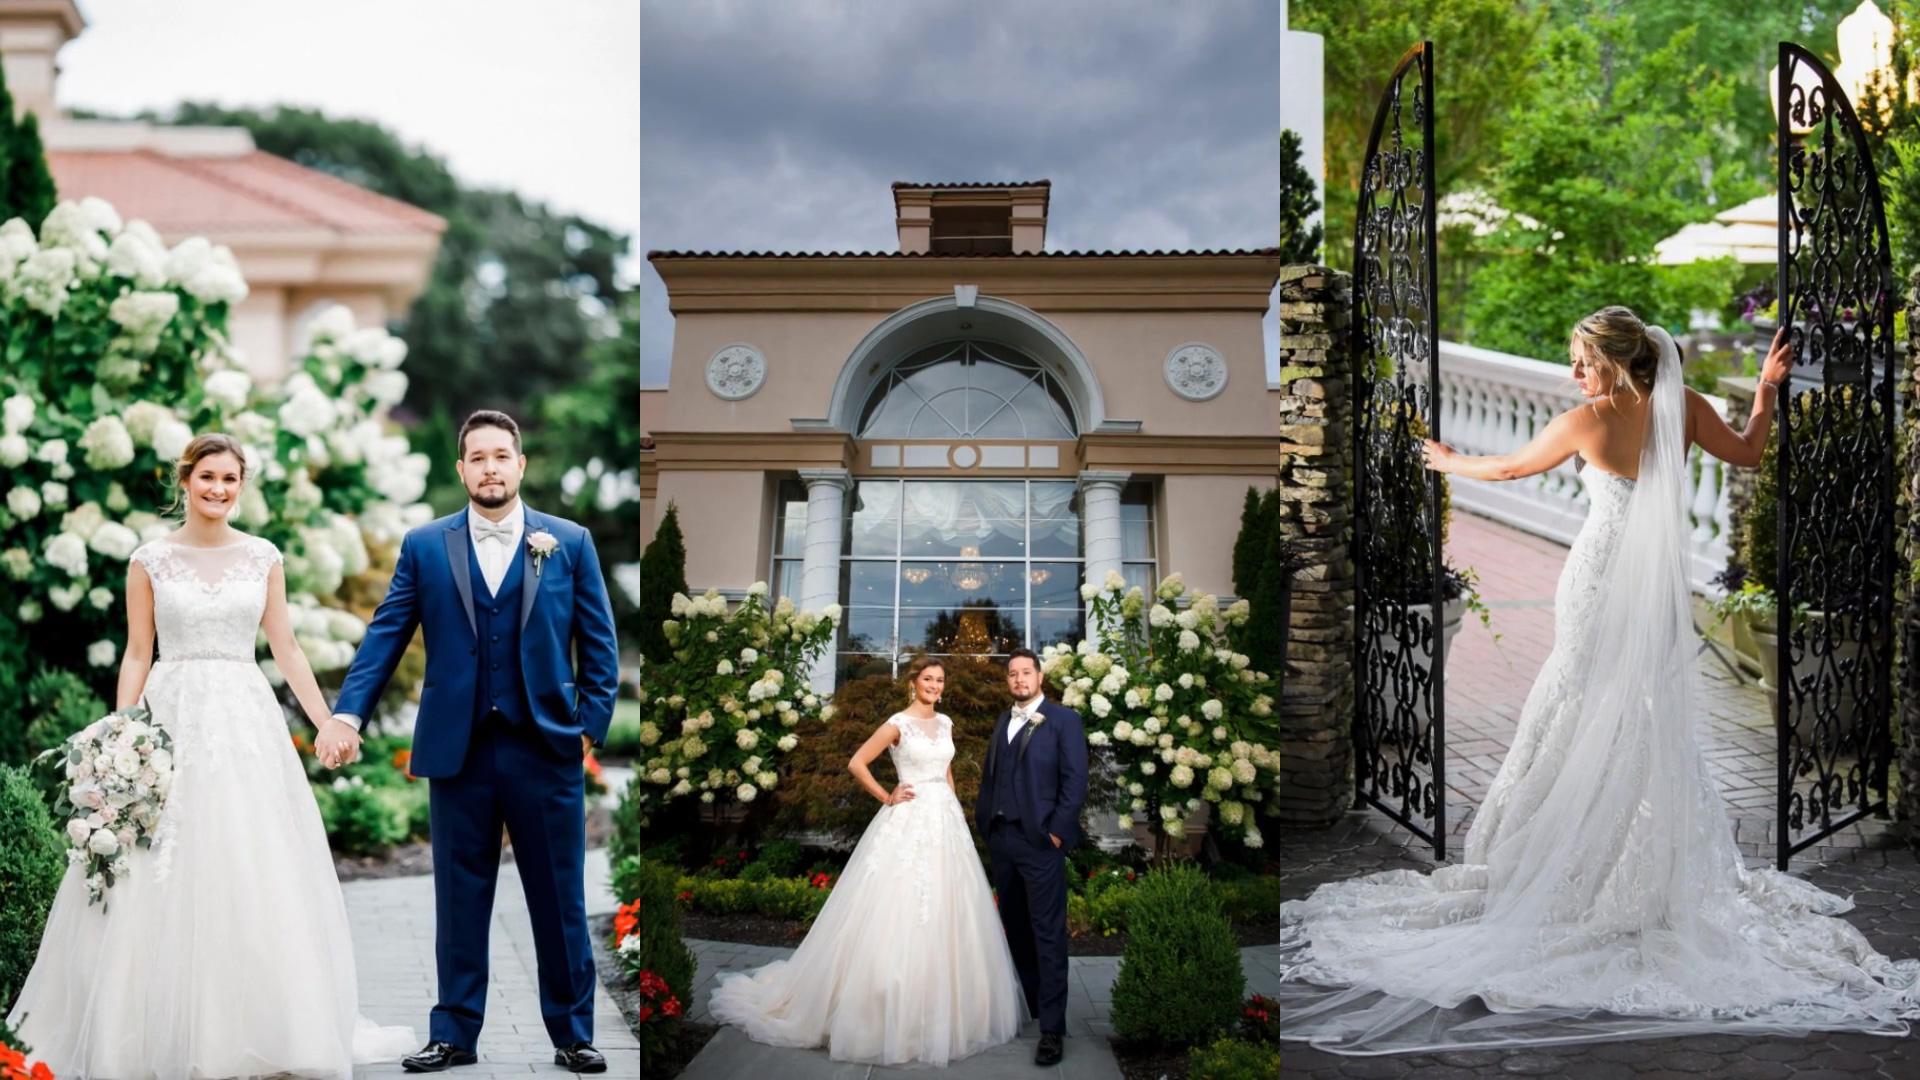 2020_Villa_Lombardis_Wedding_Photos_1080p